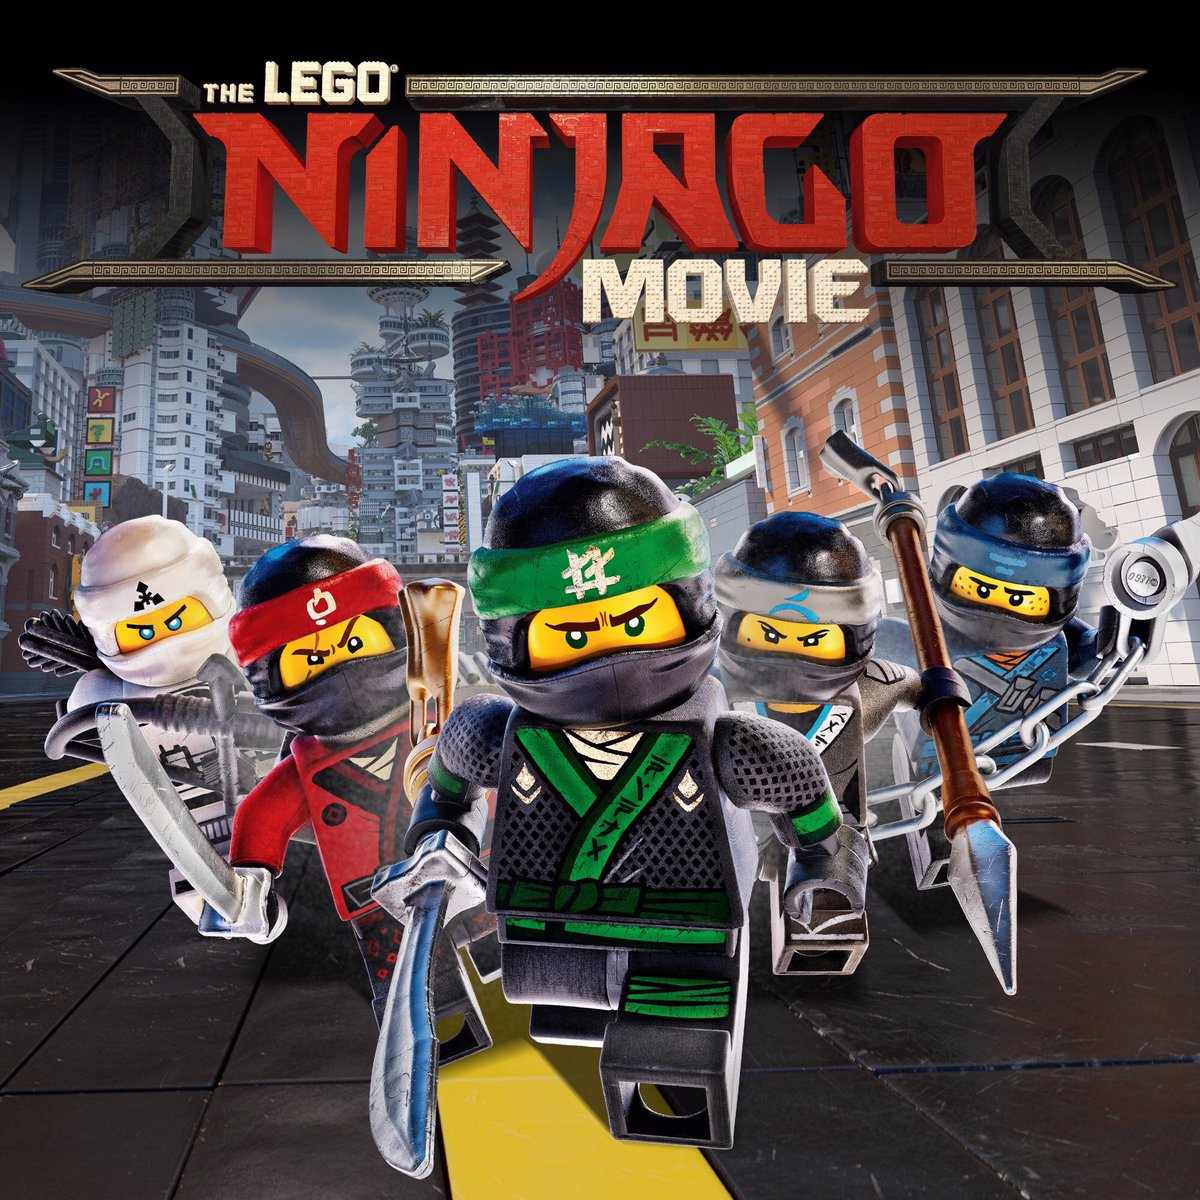 The Lego Ninjago Movie Arlington Cinema And Drafthouse